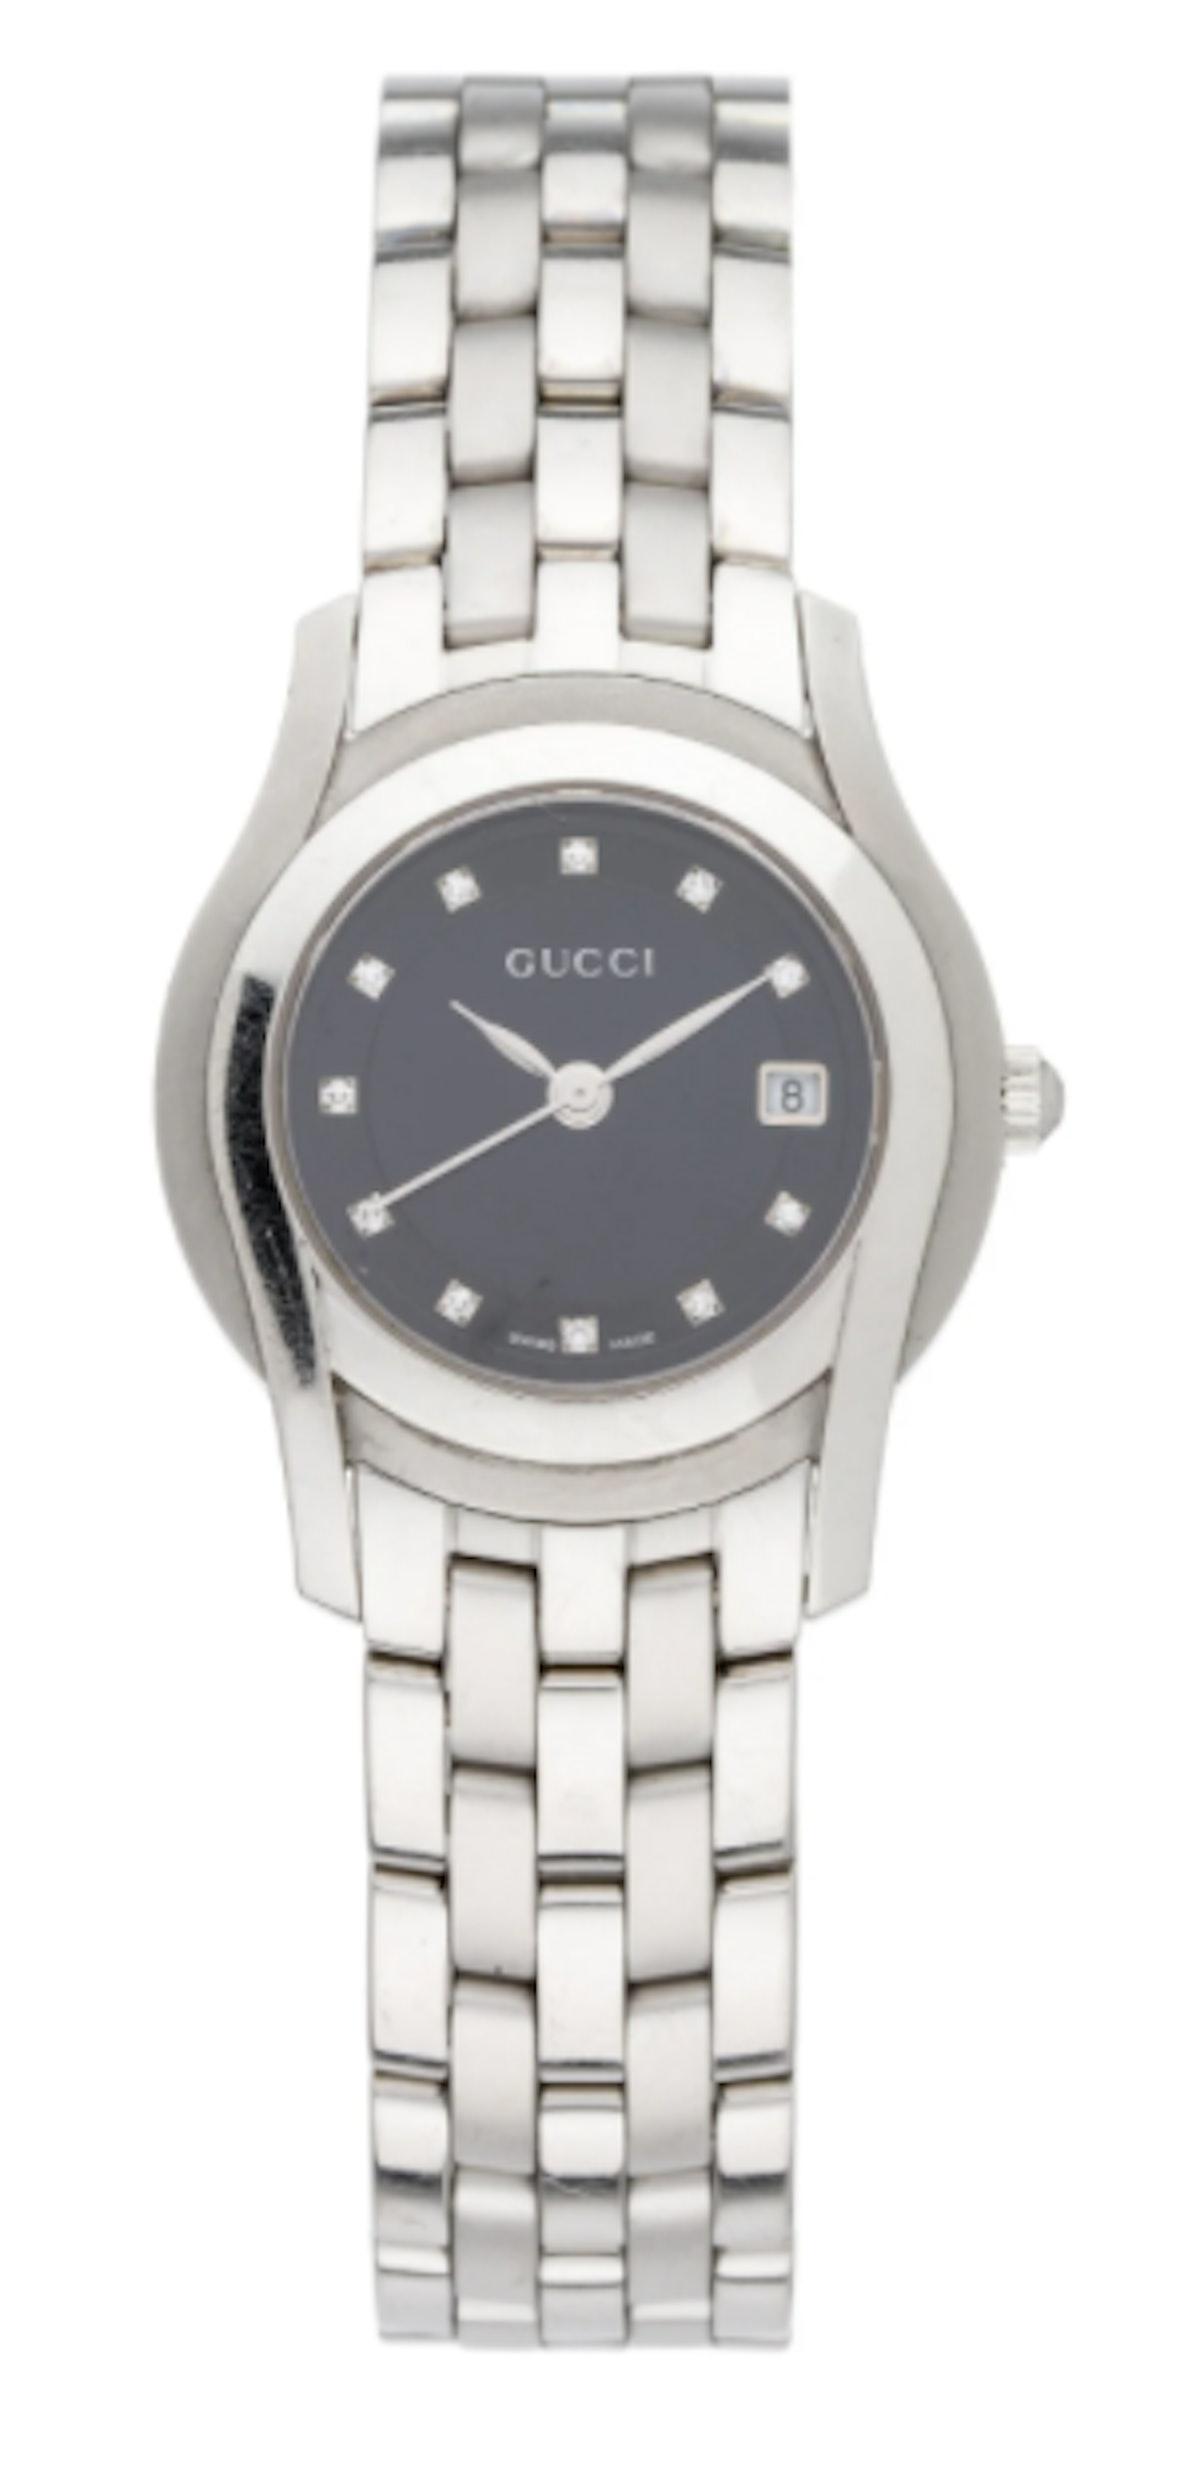 5500 Series Watch